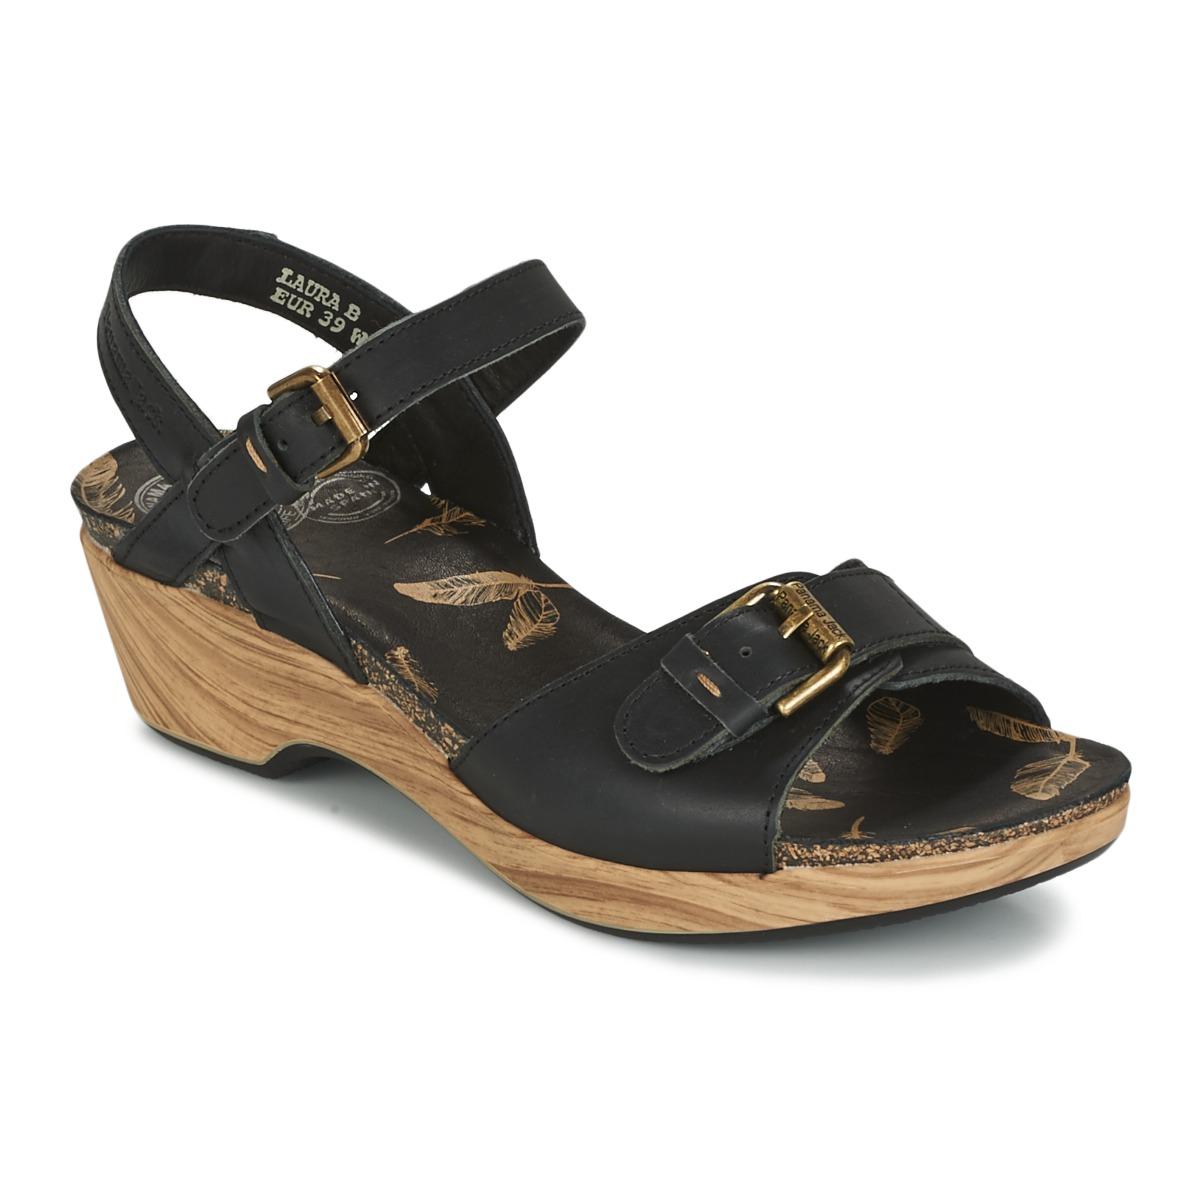 Sandale Panama Jack LAURA Noir